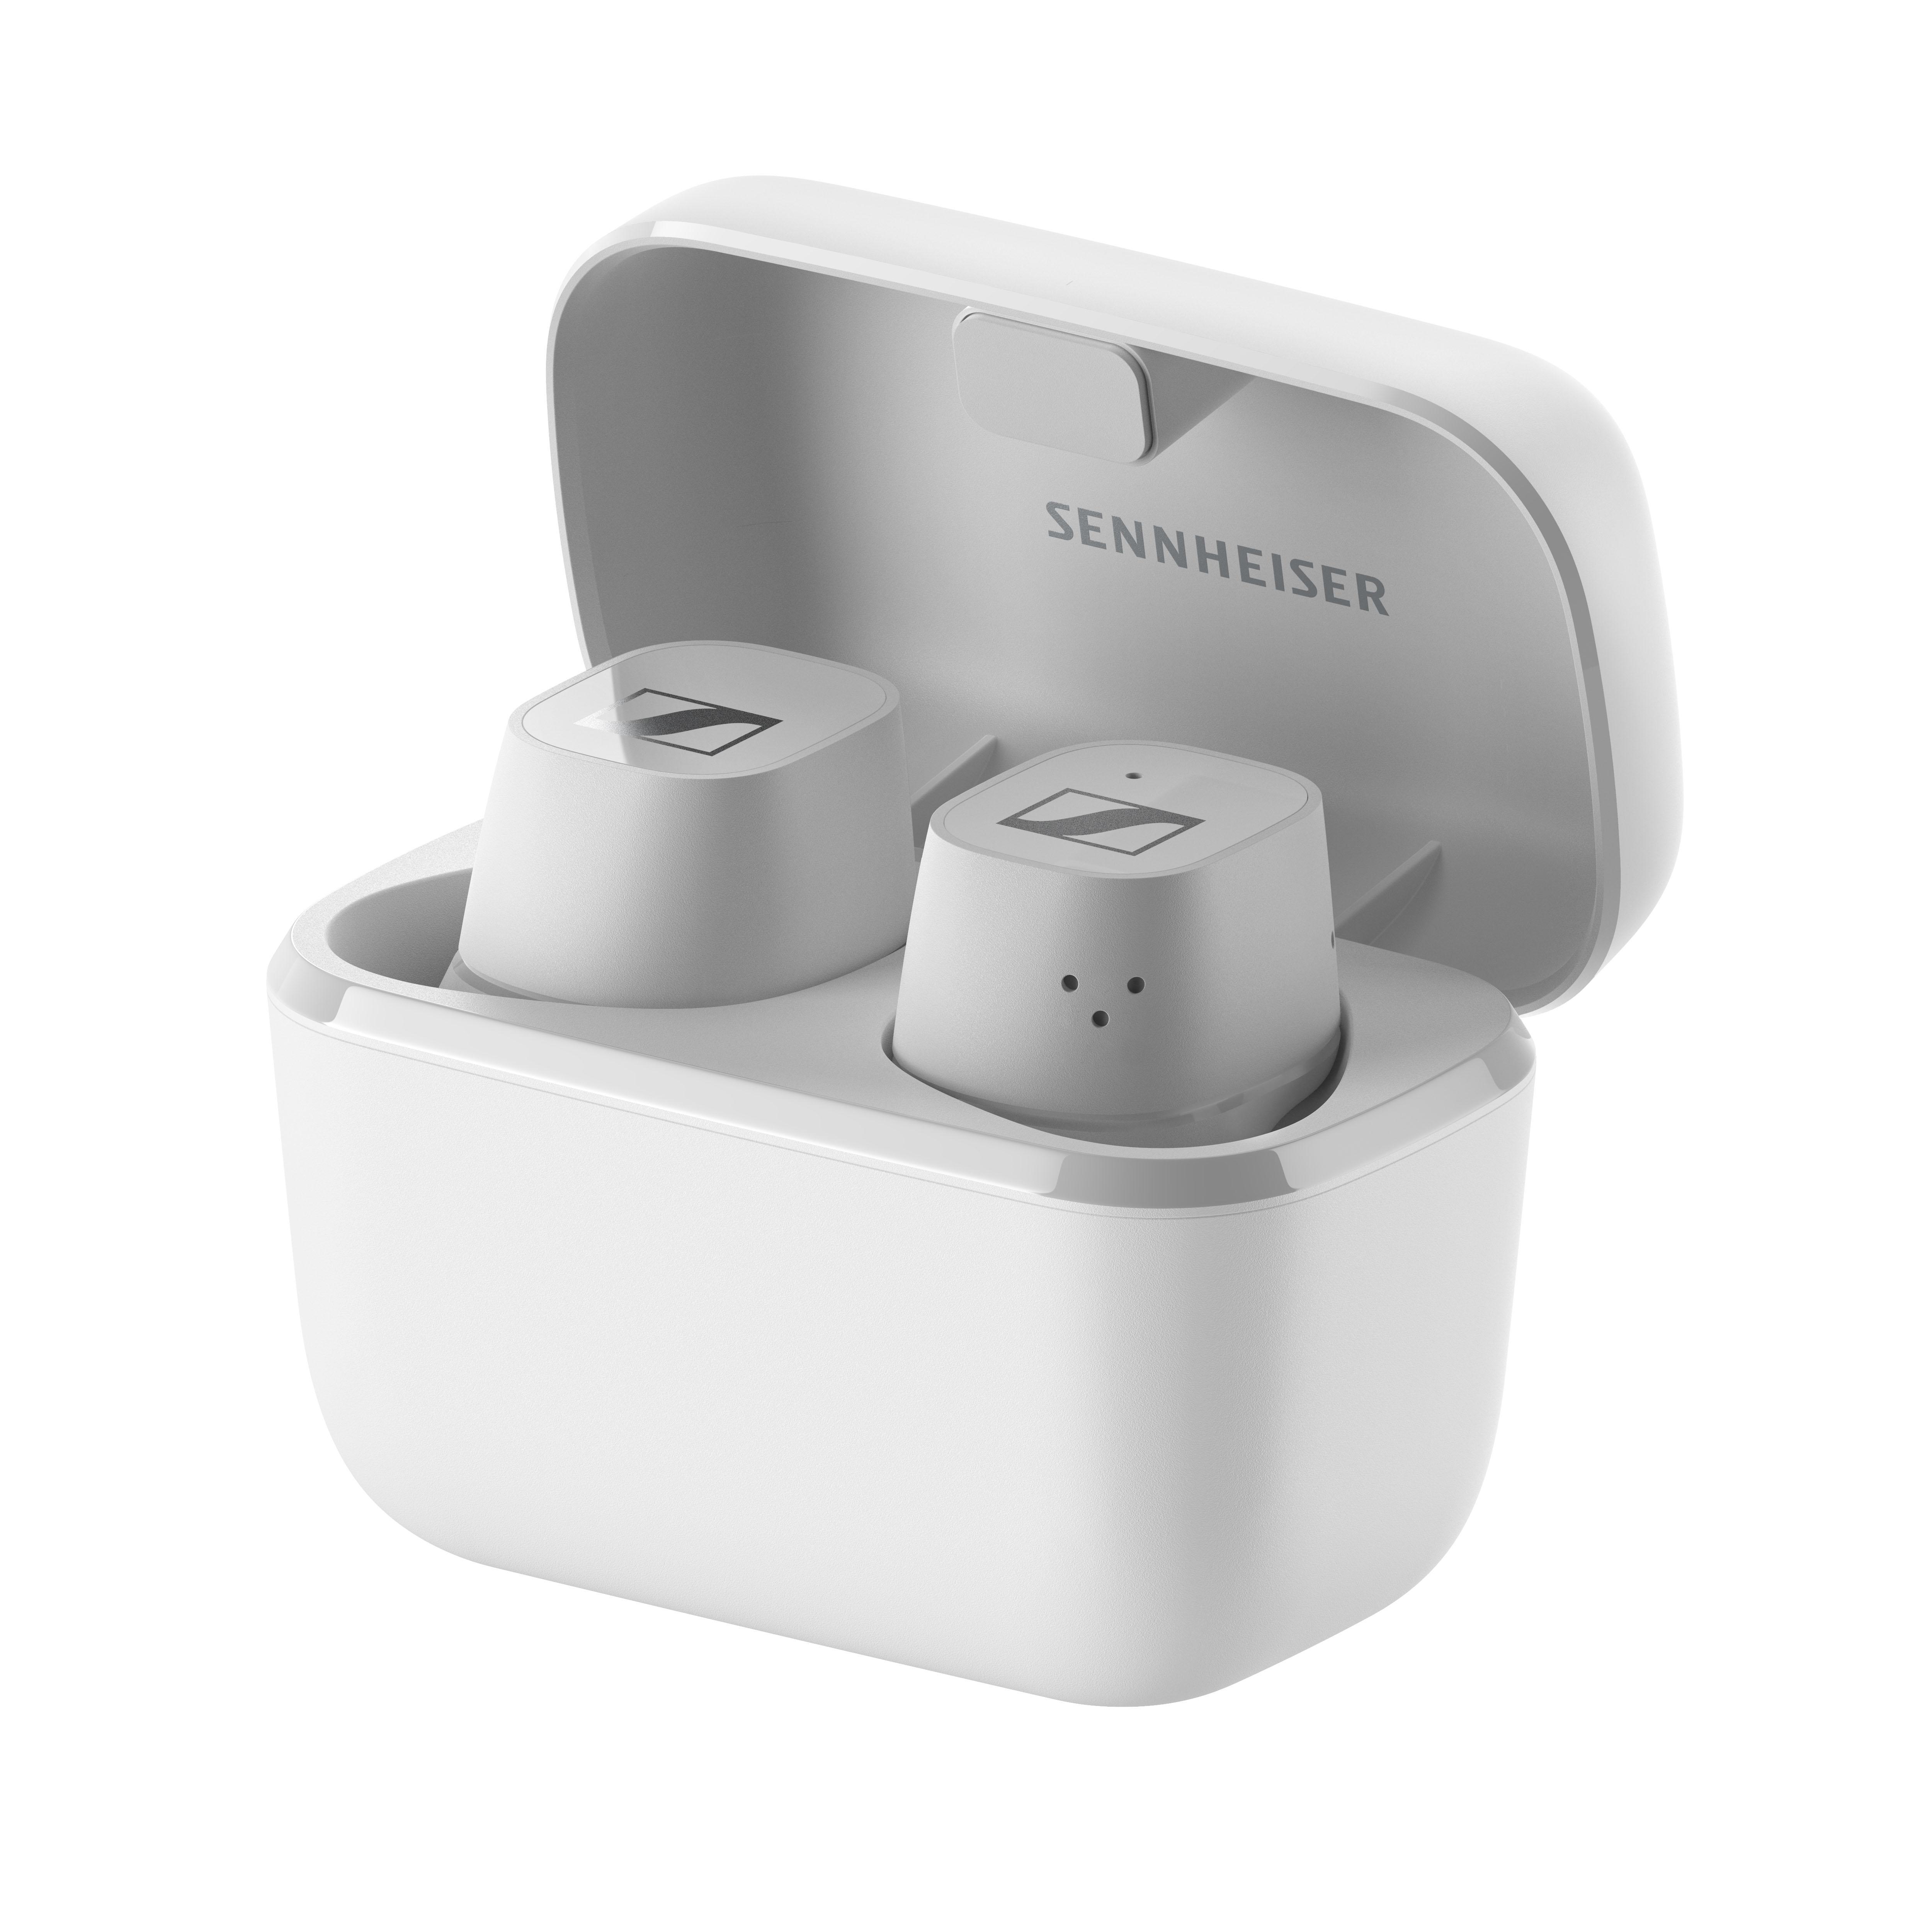 Sennheiser - CX 400 Wireless Earphones With Bluetooth - White